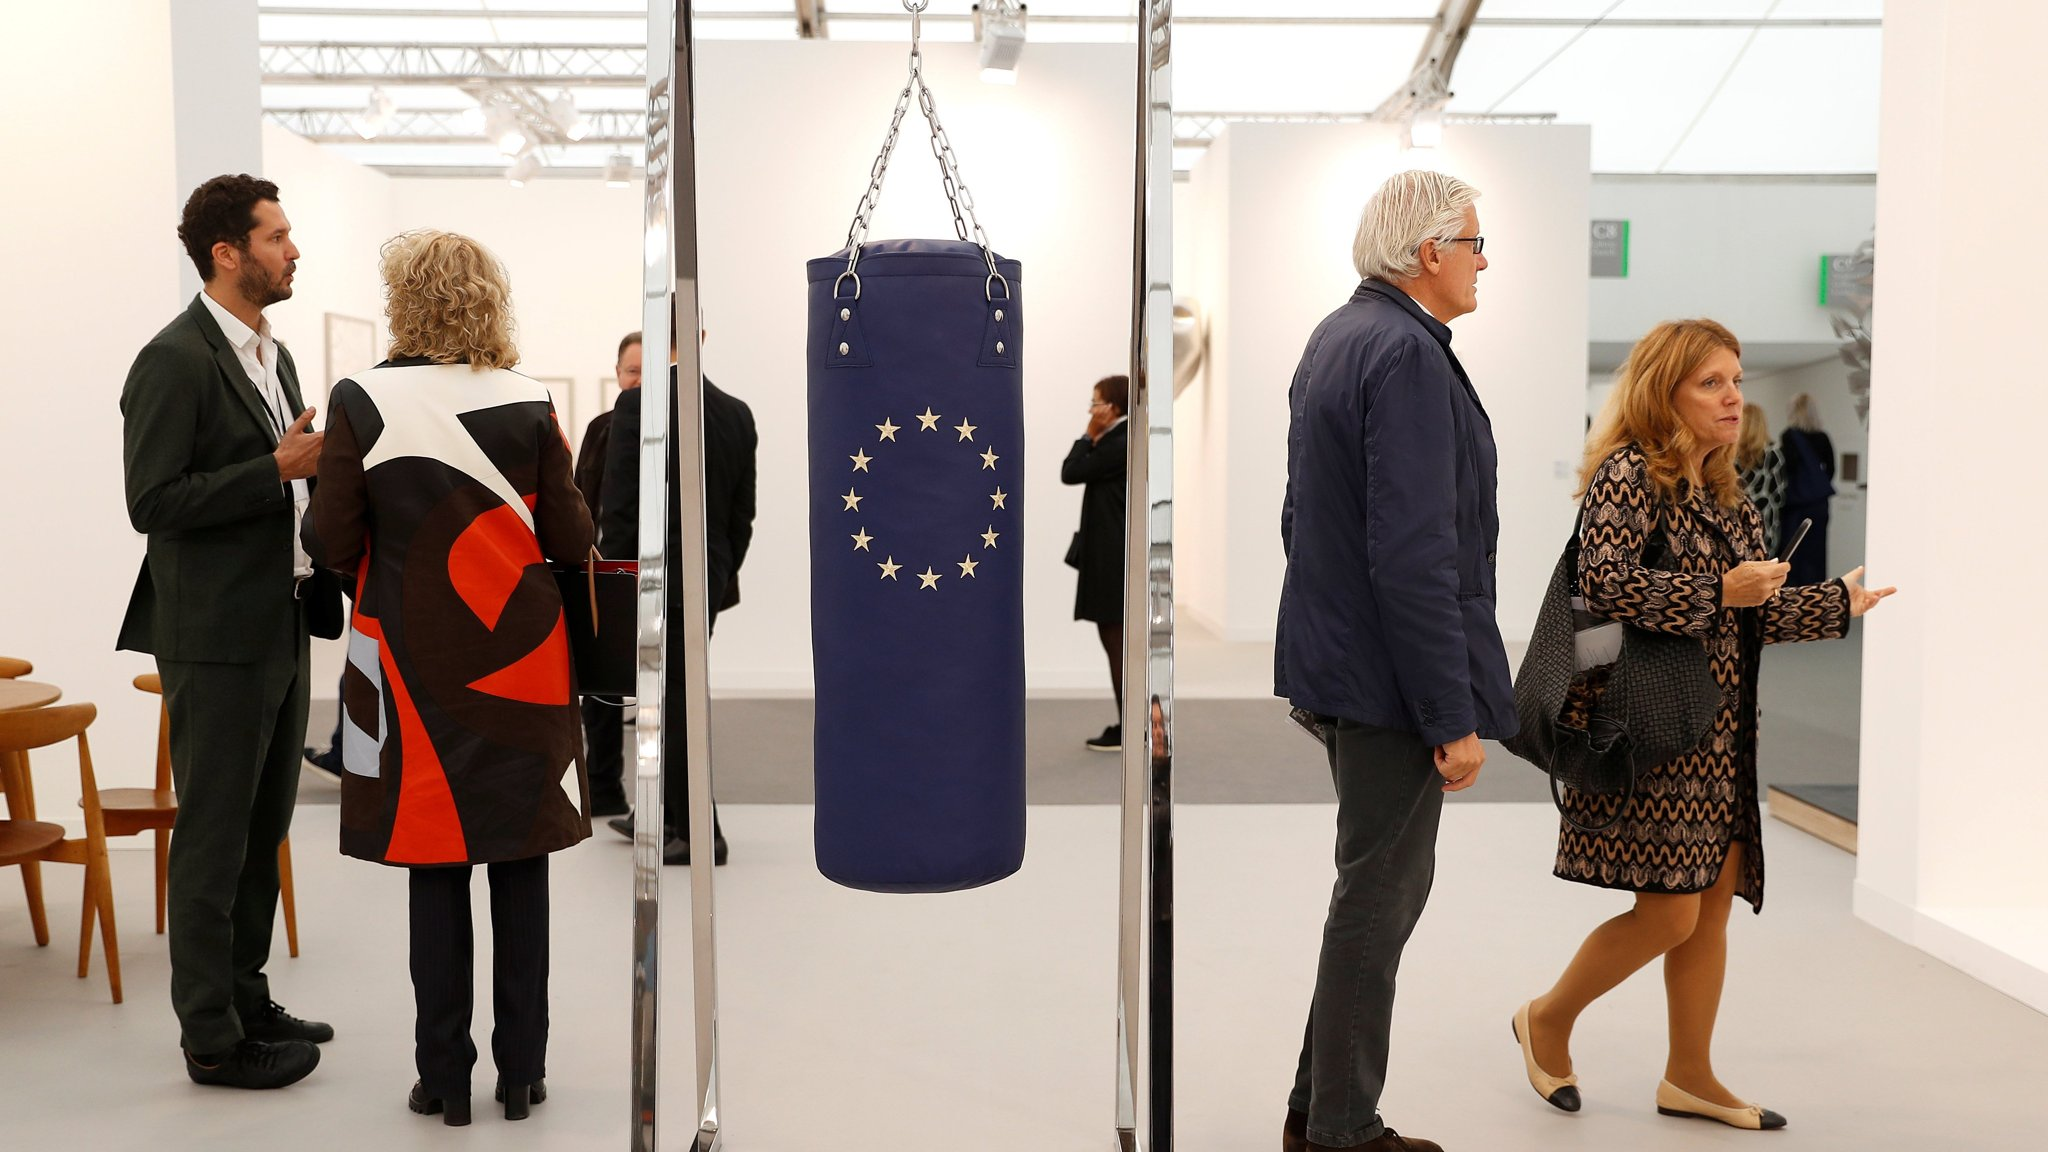 London art market braces for no-deal Brexit tax hikes